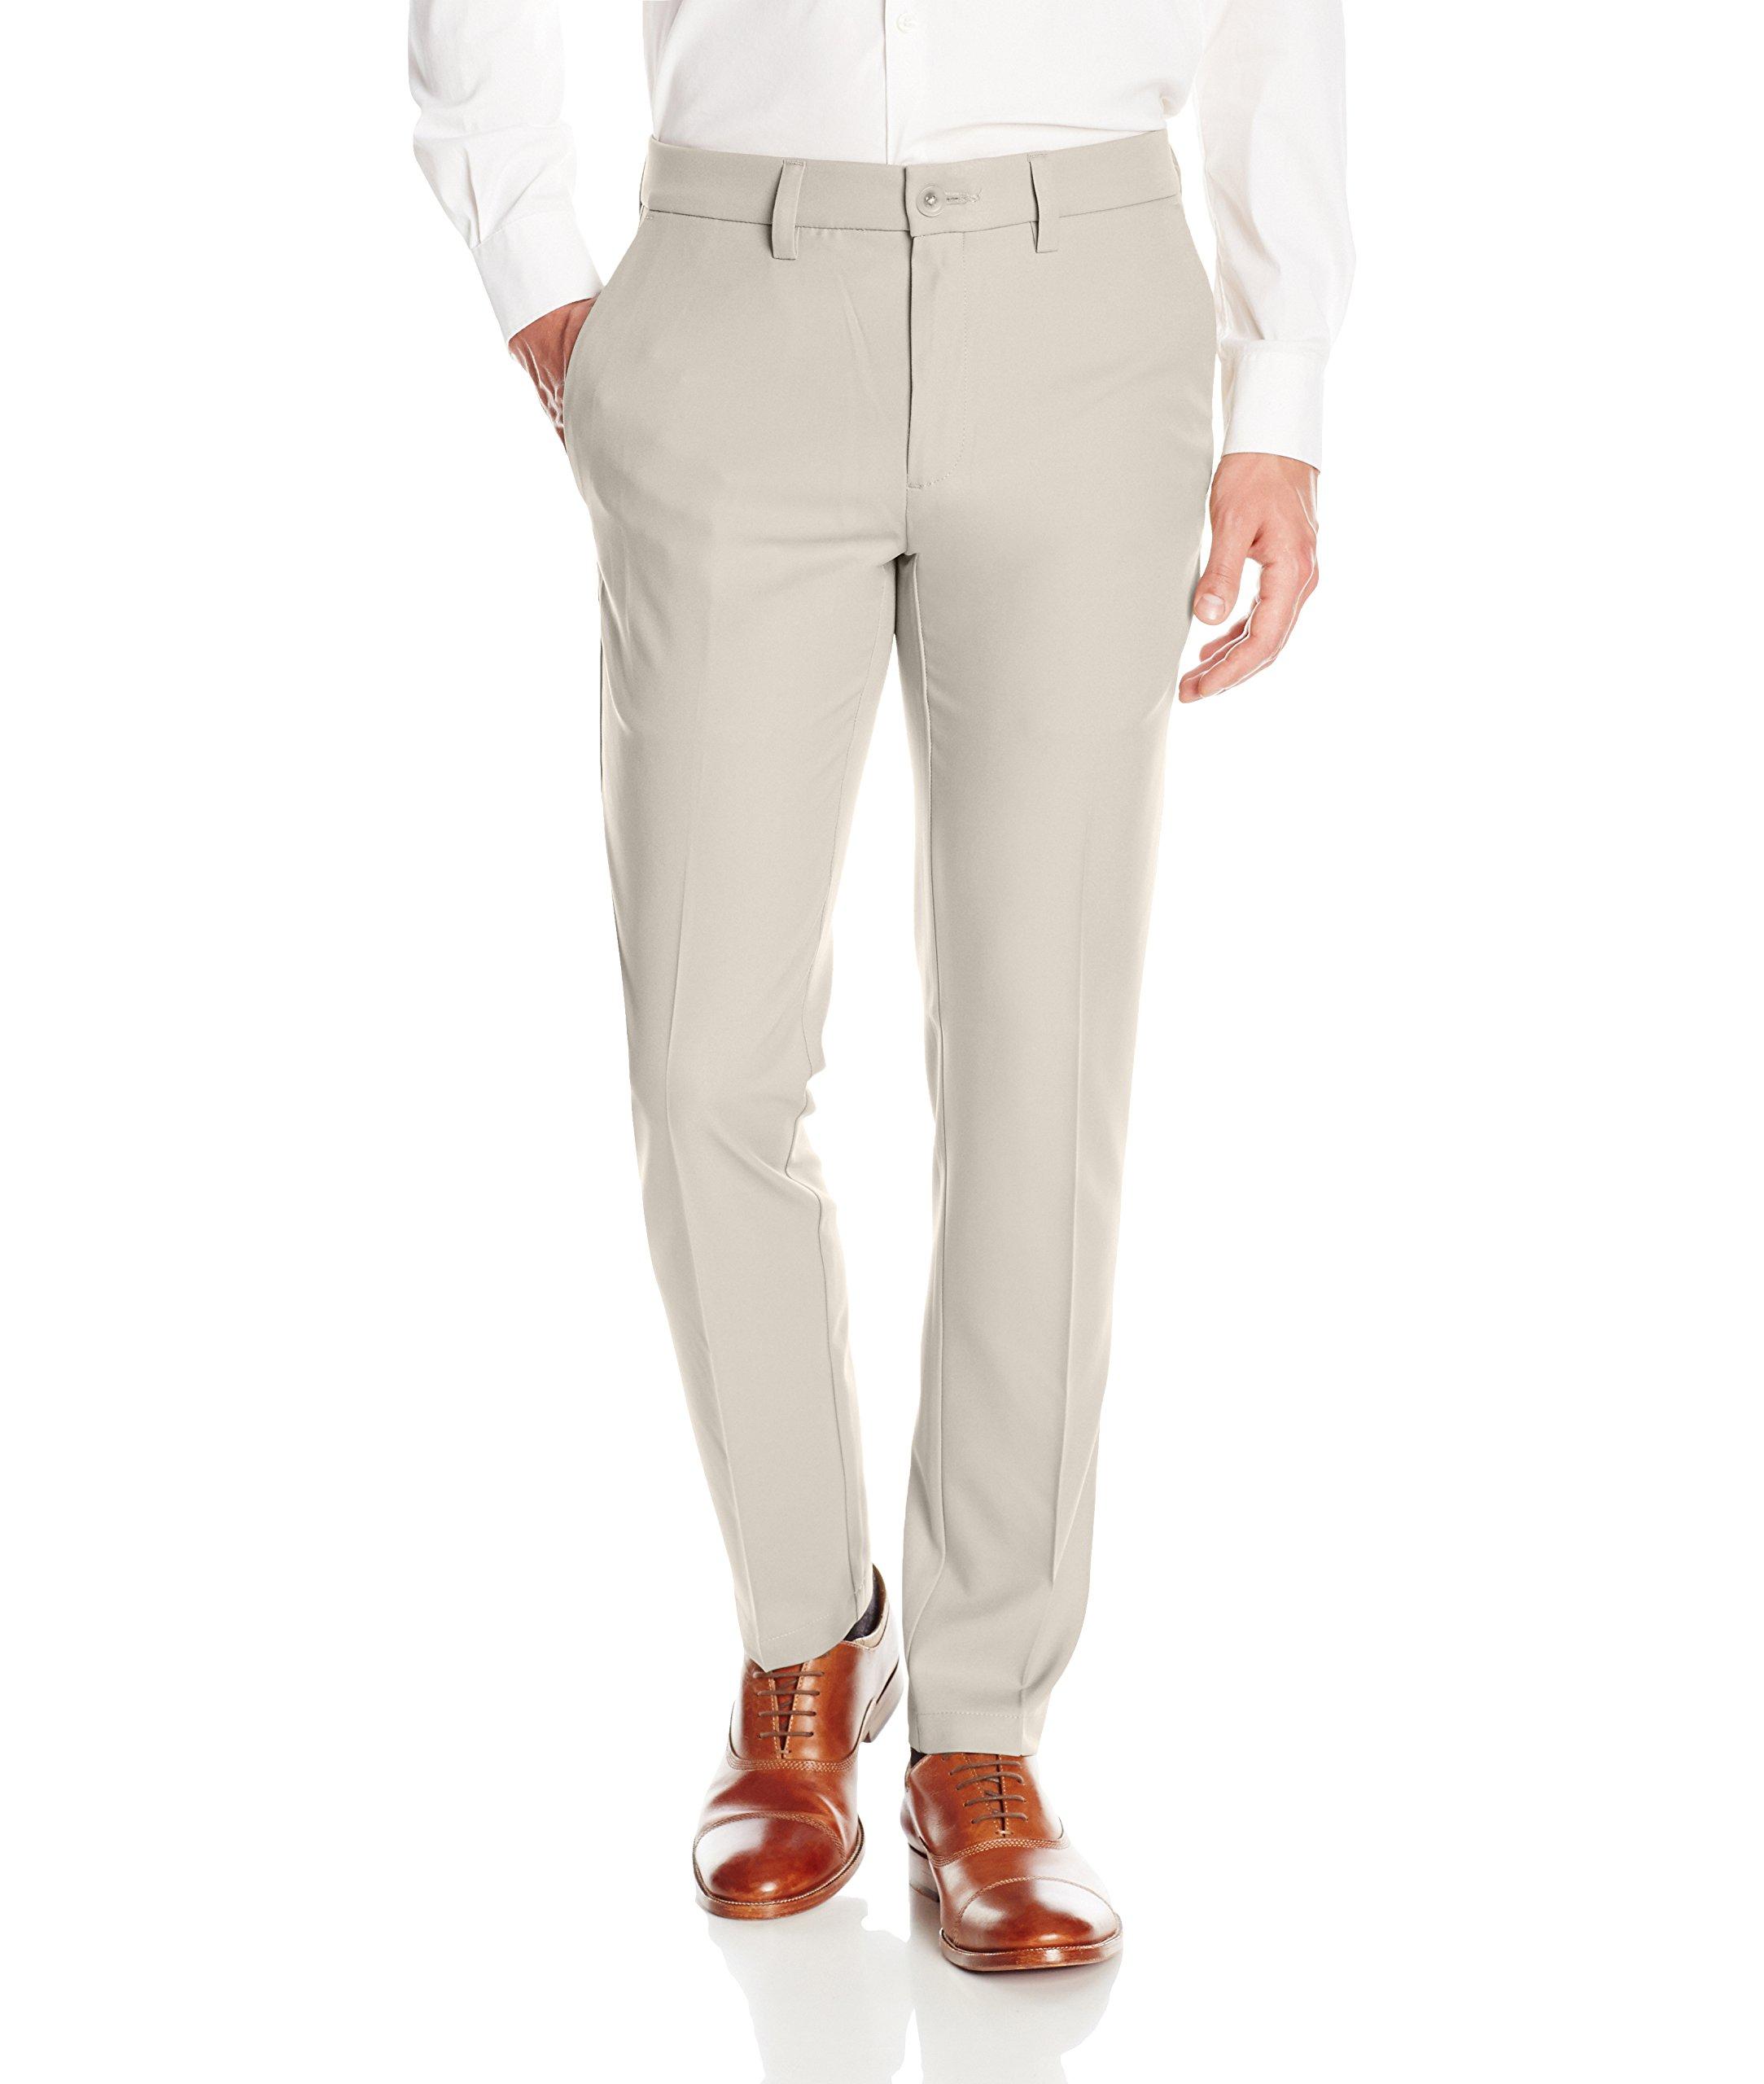 b70fd1286bb Haggar Men s Cool 18 Pro Slim Fit Flat Front Superflex Waistband Pant